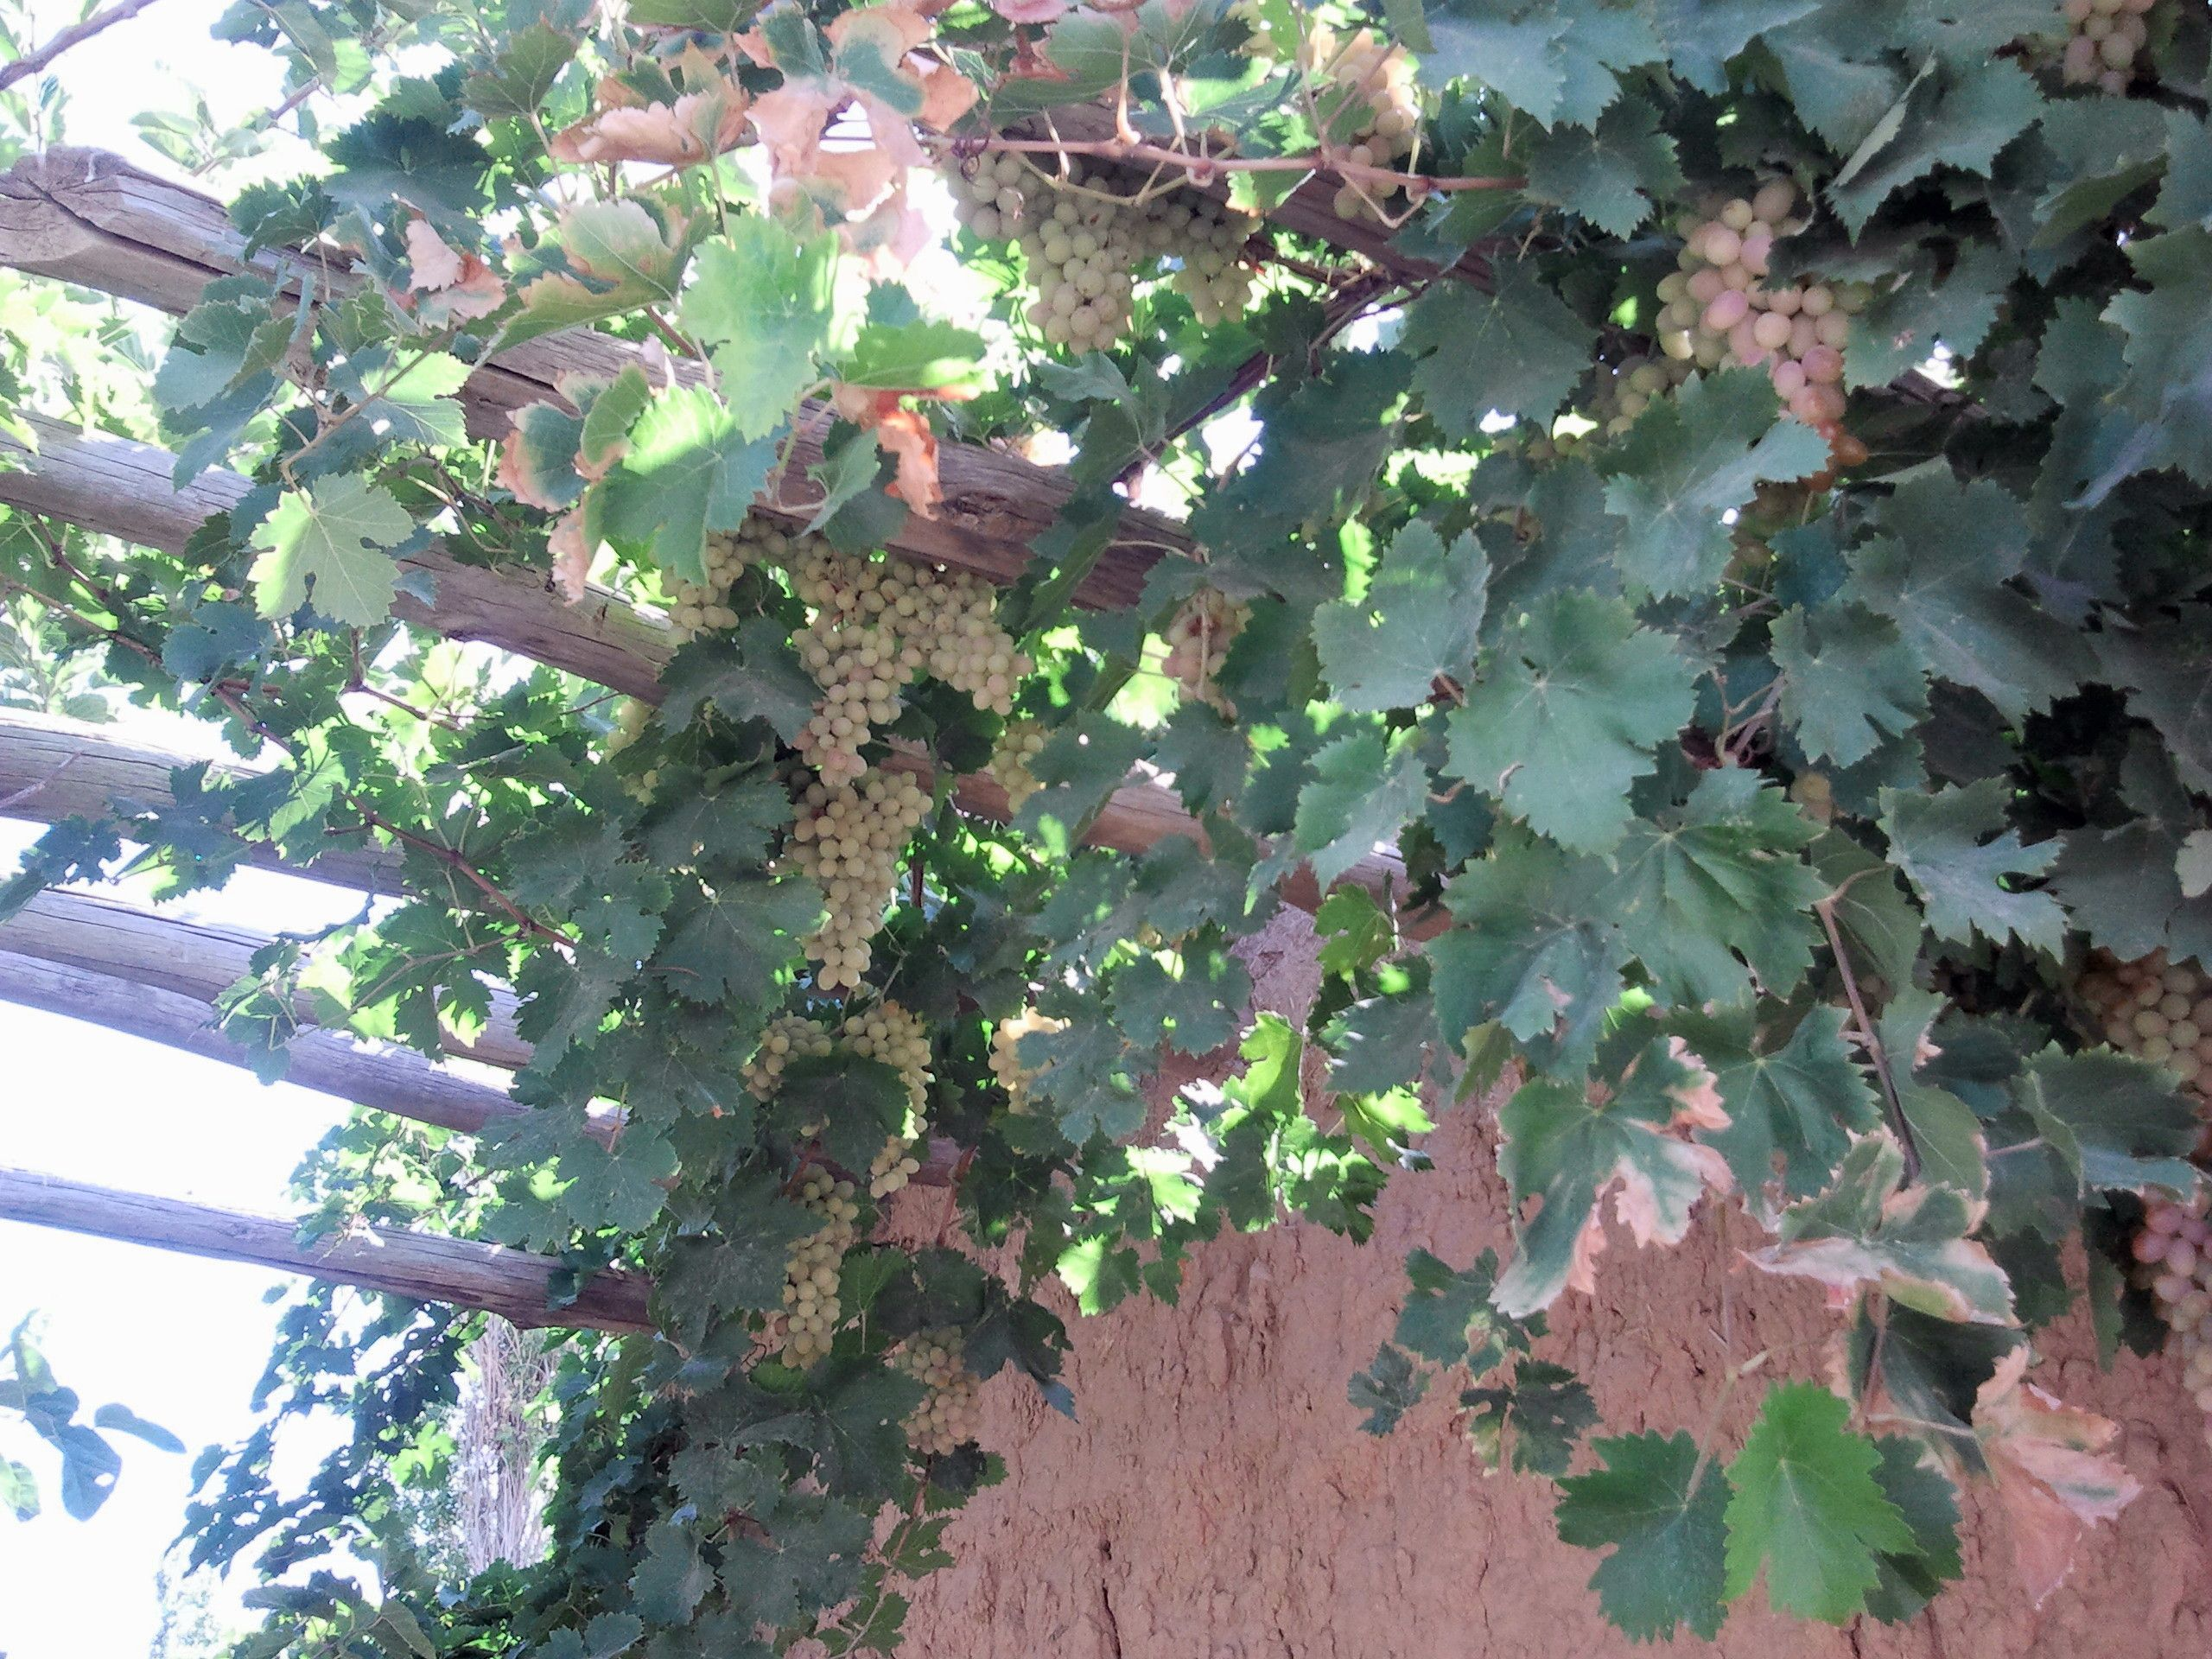 Grapesshahrood iran grapes plants garden